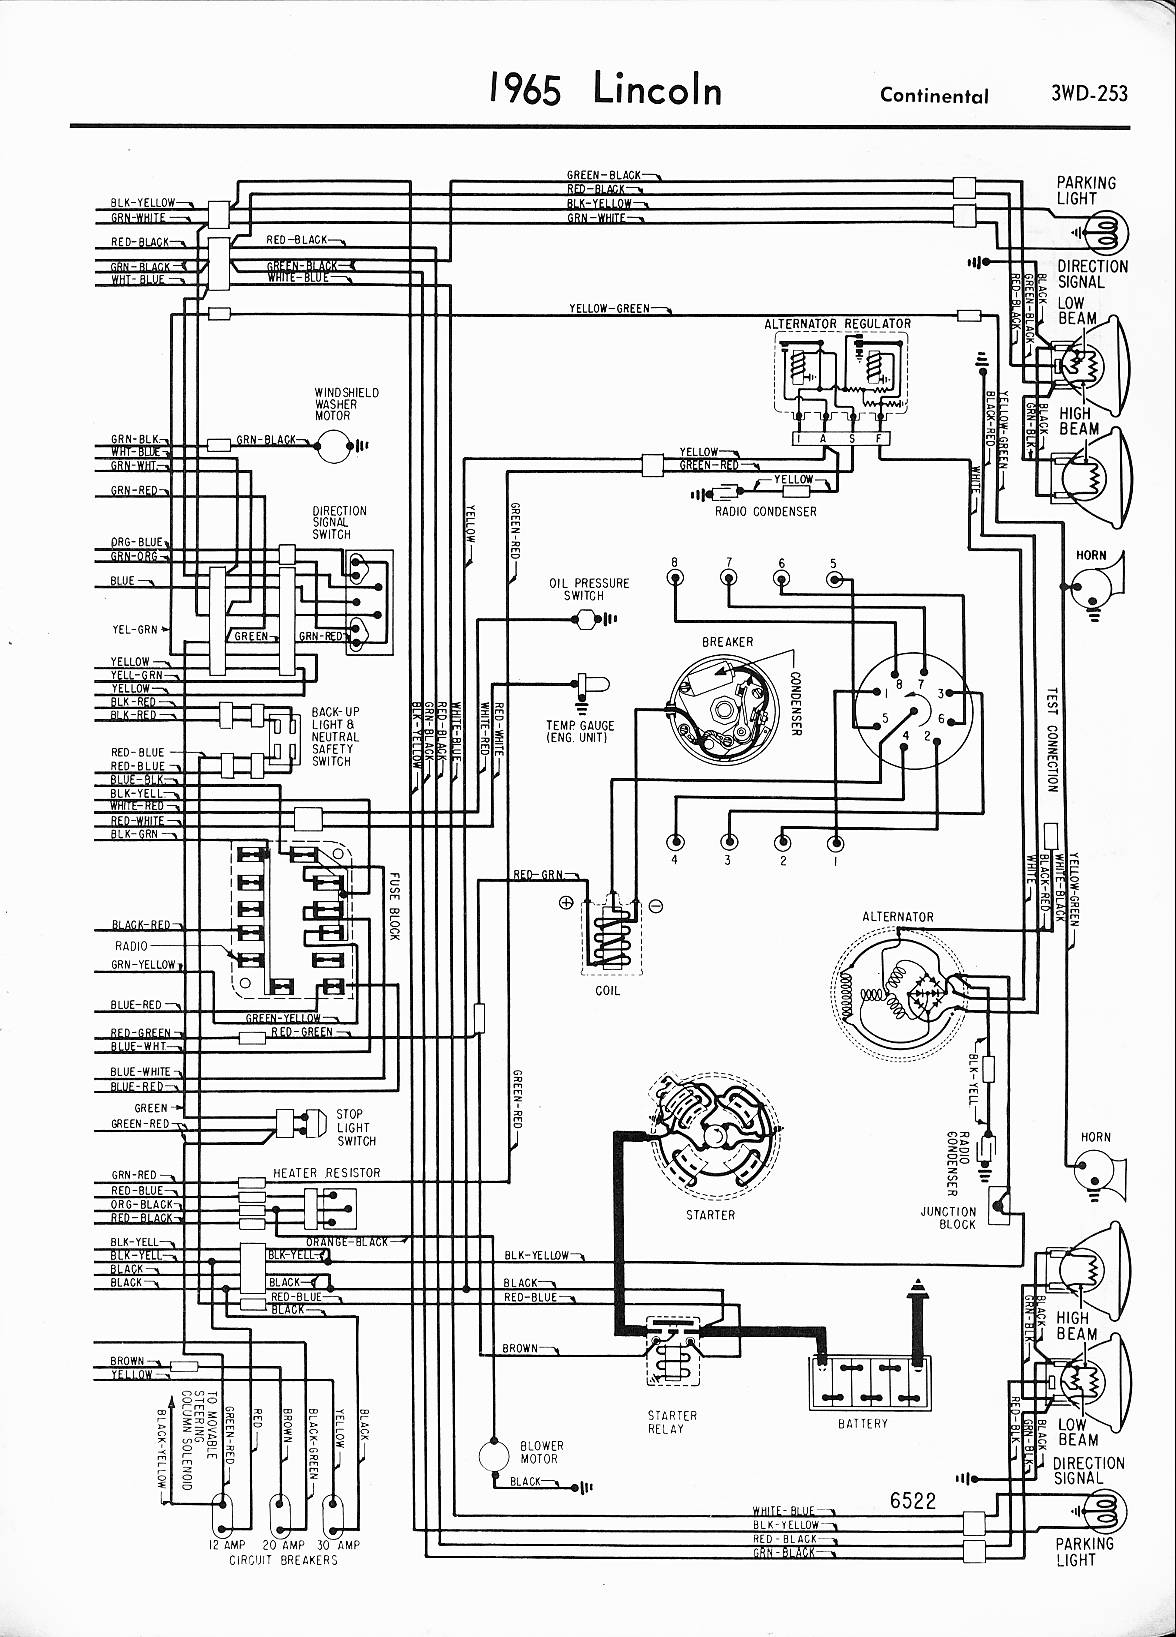 1997 lincoln town car wiring diagram trigeminal nerve air ride library